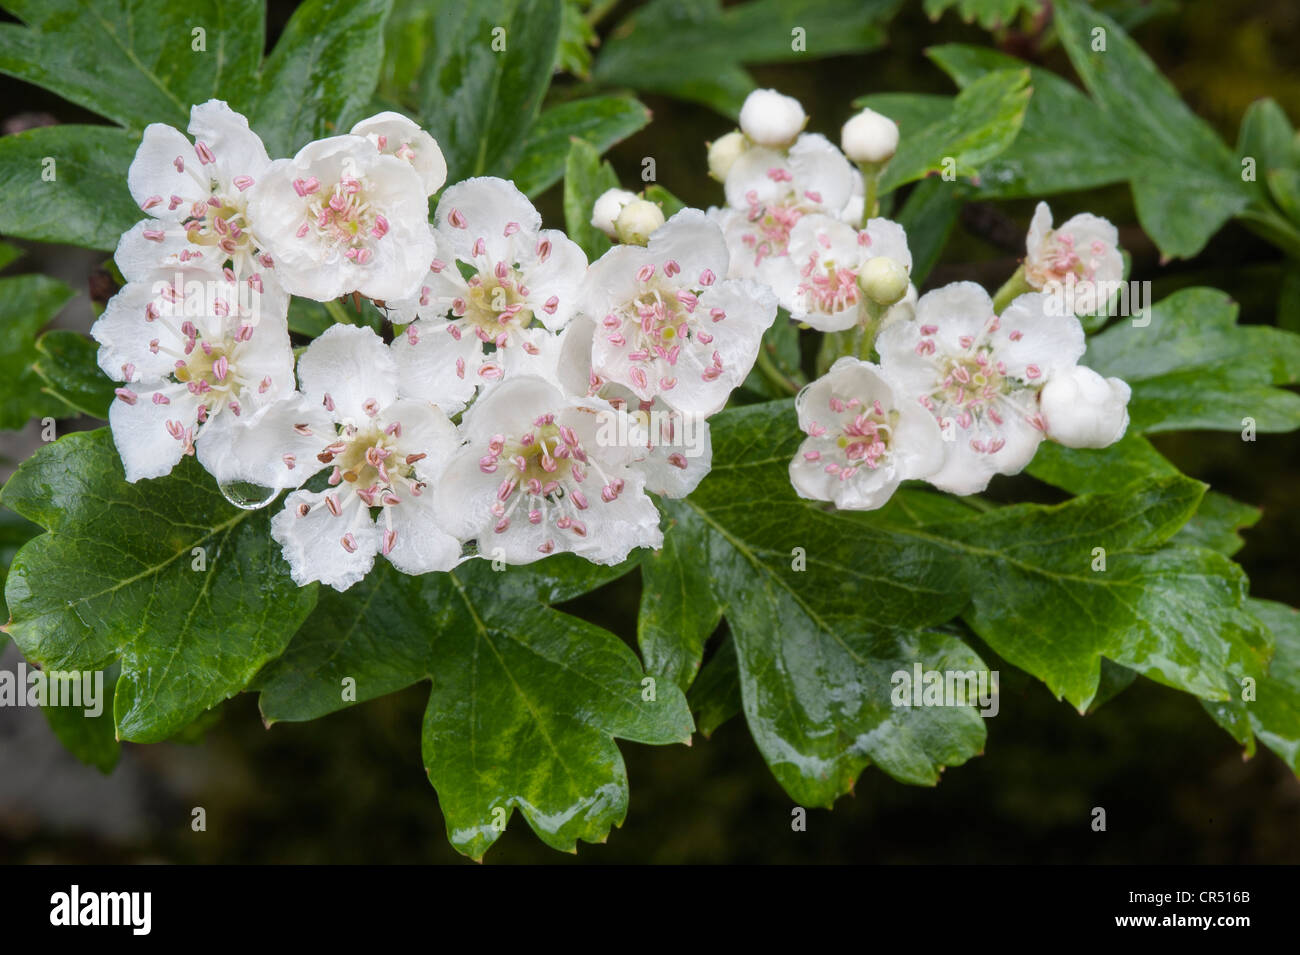 Hawthorn (Crataegus monogyna) branch with flowers in rain Malham Tarn FSC grounds Yorkshire Dales National Park - Stock Image